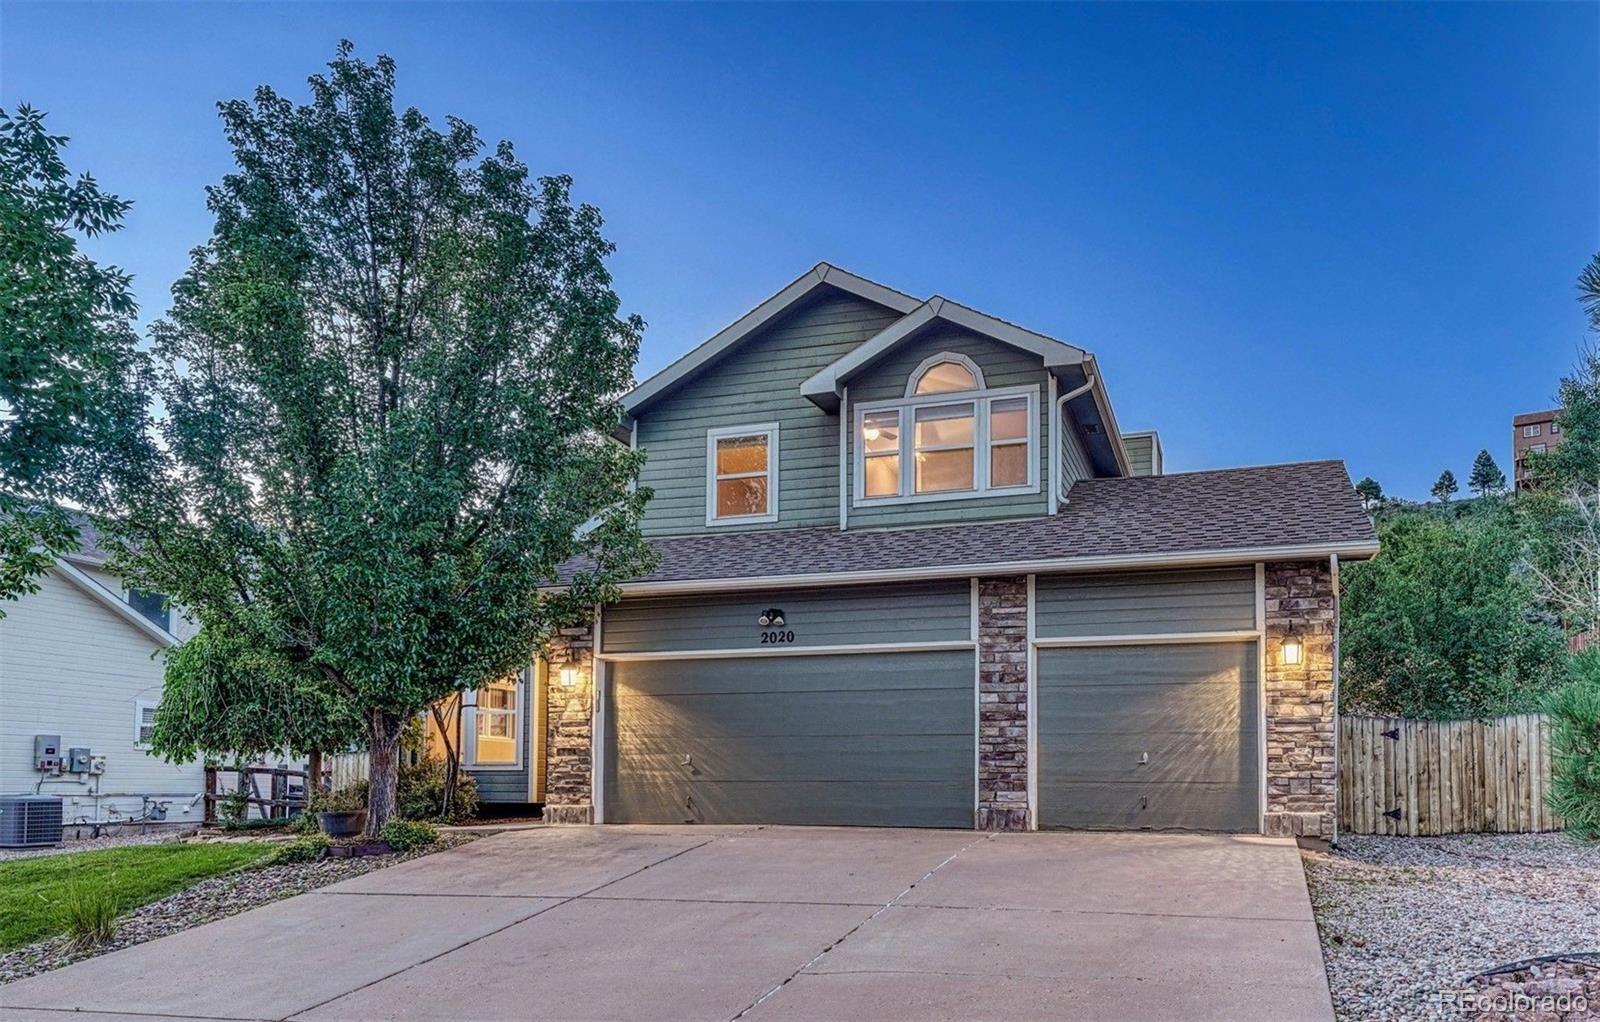 Photo of 2020 Bluffside Terrace, Colorado Springs, CO 80919 (MLS # 2017564)